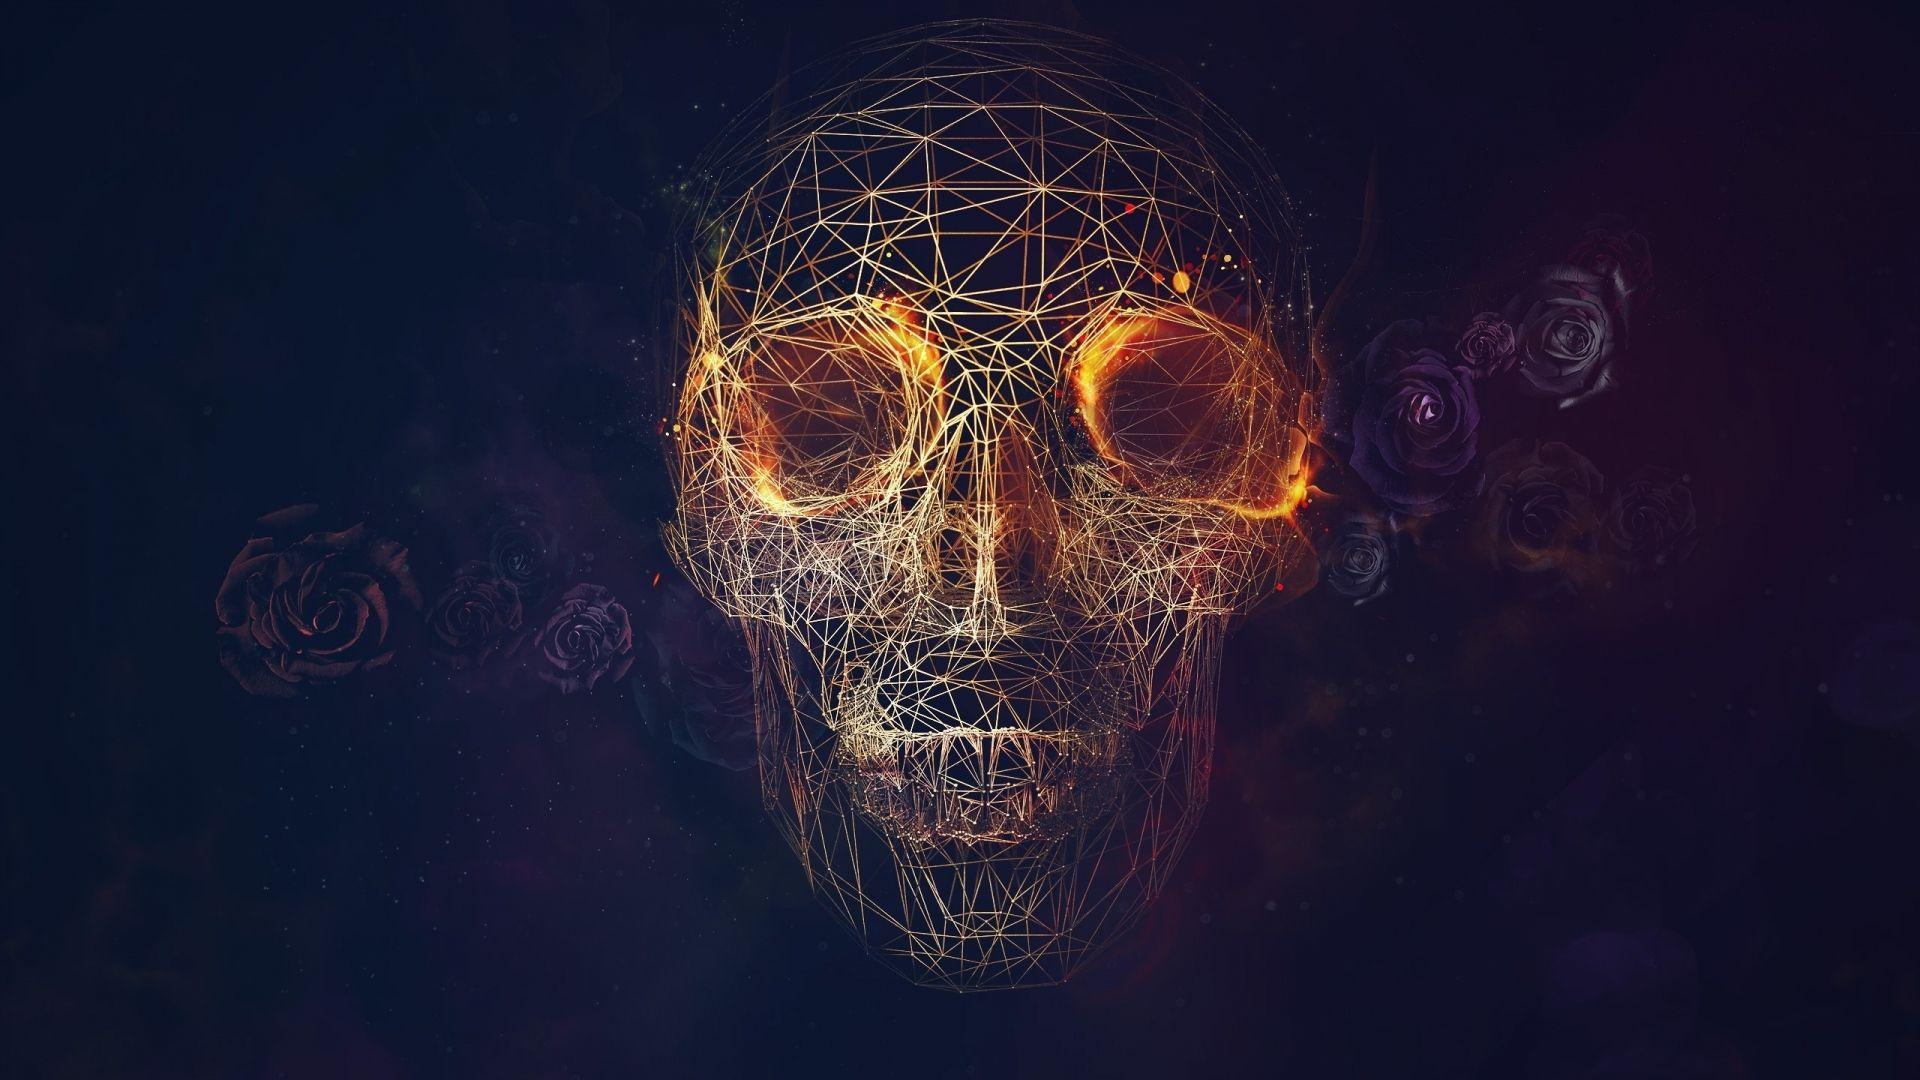 Geometry wallpapers wallpaper cave - Skull 4k images ...